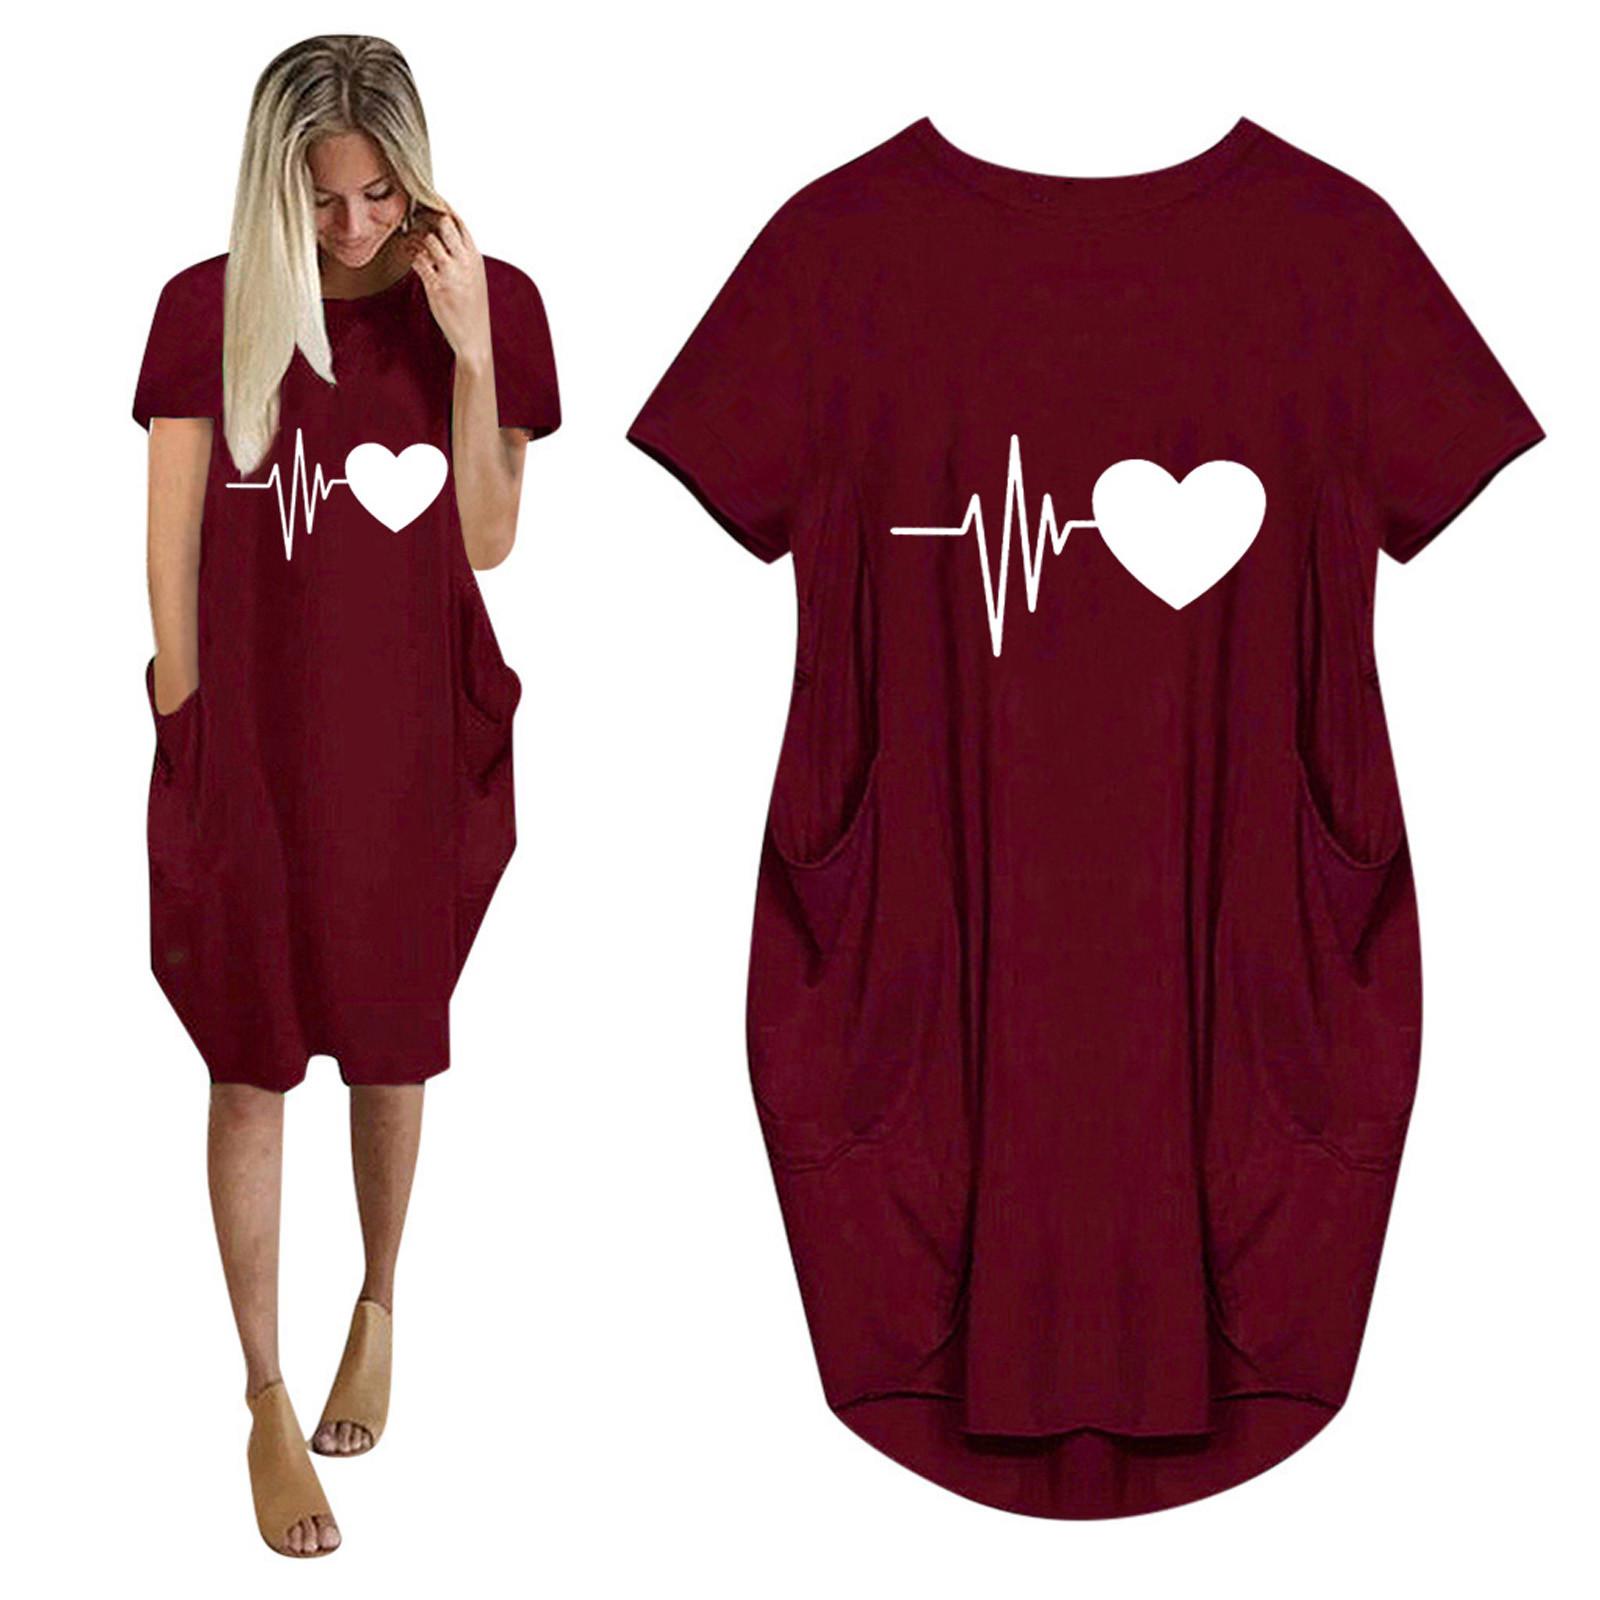 40# Office Lady Love Print Loose Dress Casual Pockets O neck Short Sleeve Dresses Knee Length Plus Size Платье Больших Размеров